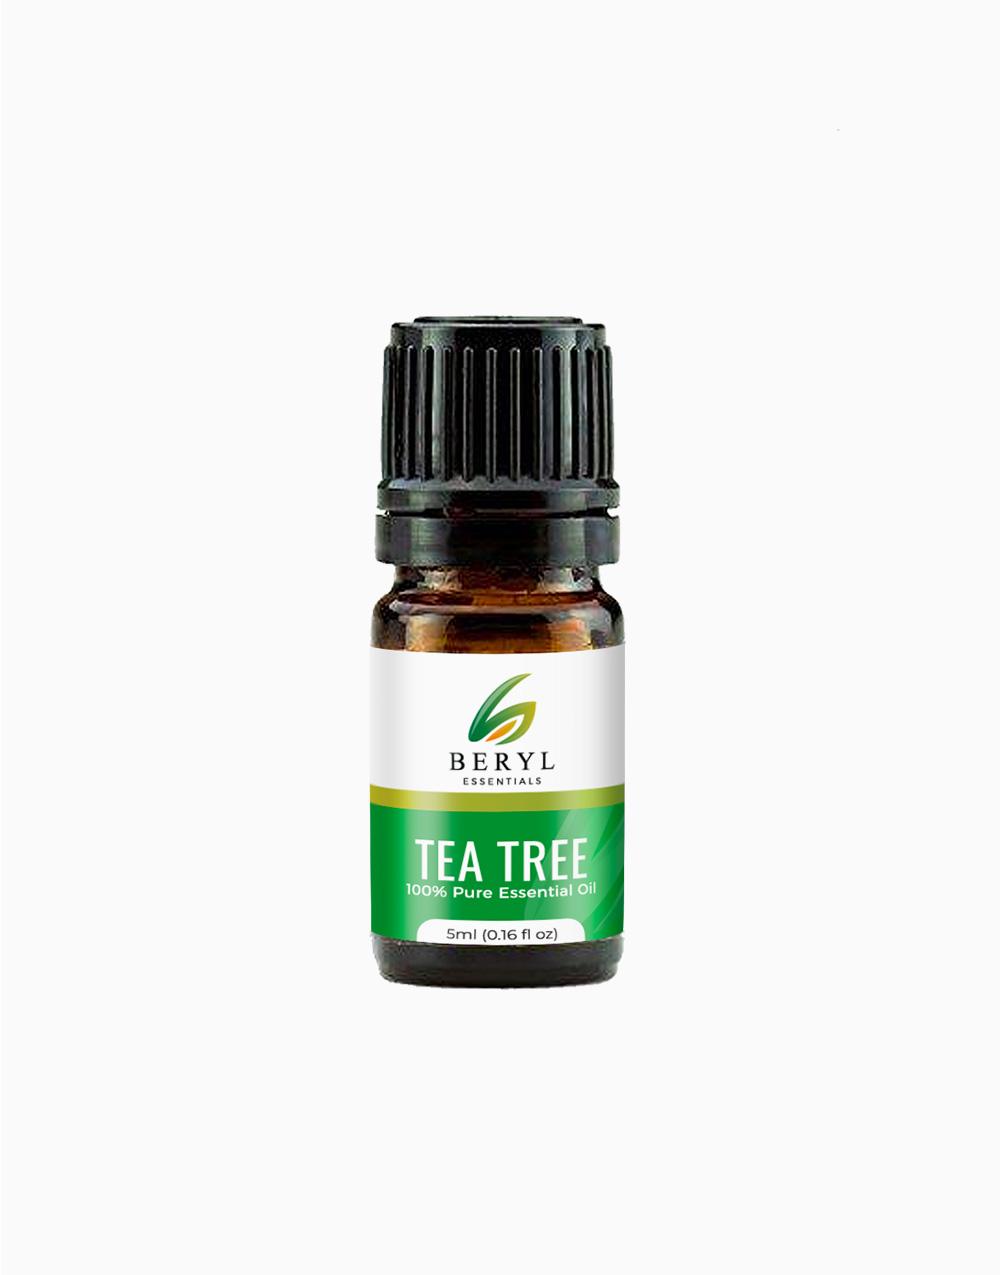 Tea Tree Essential Oil (5ml) by Beryl Essentials